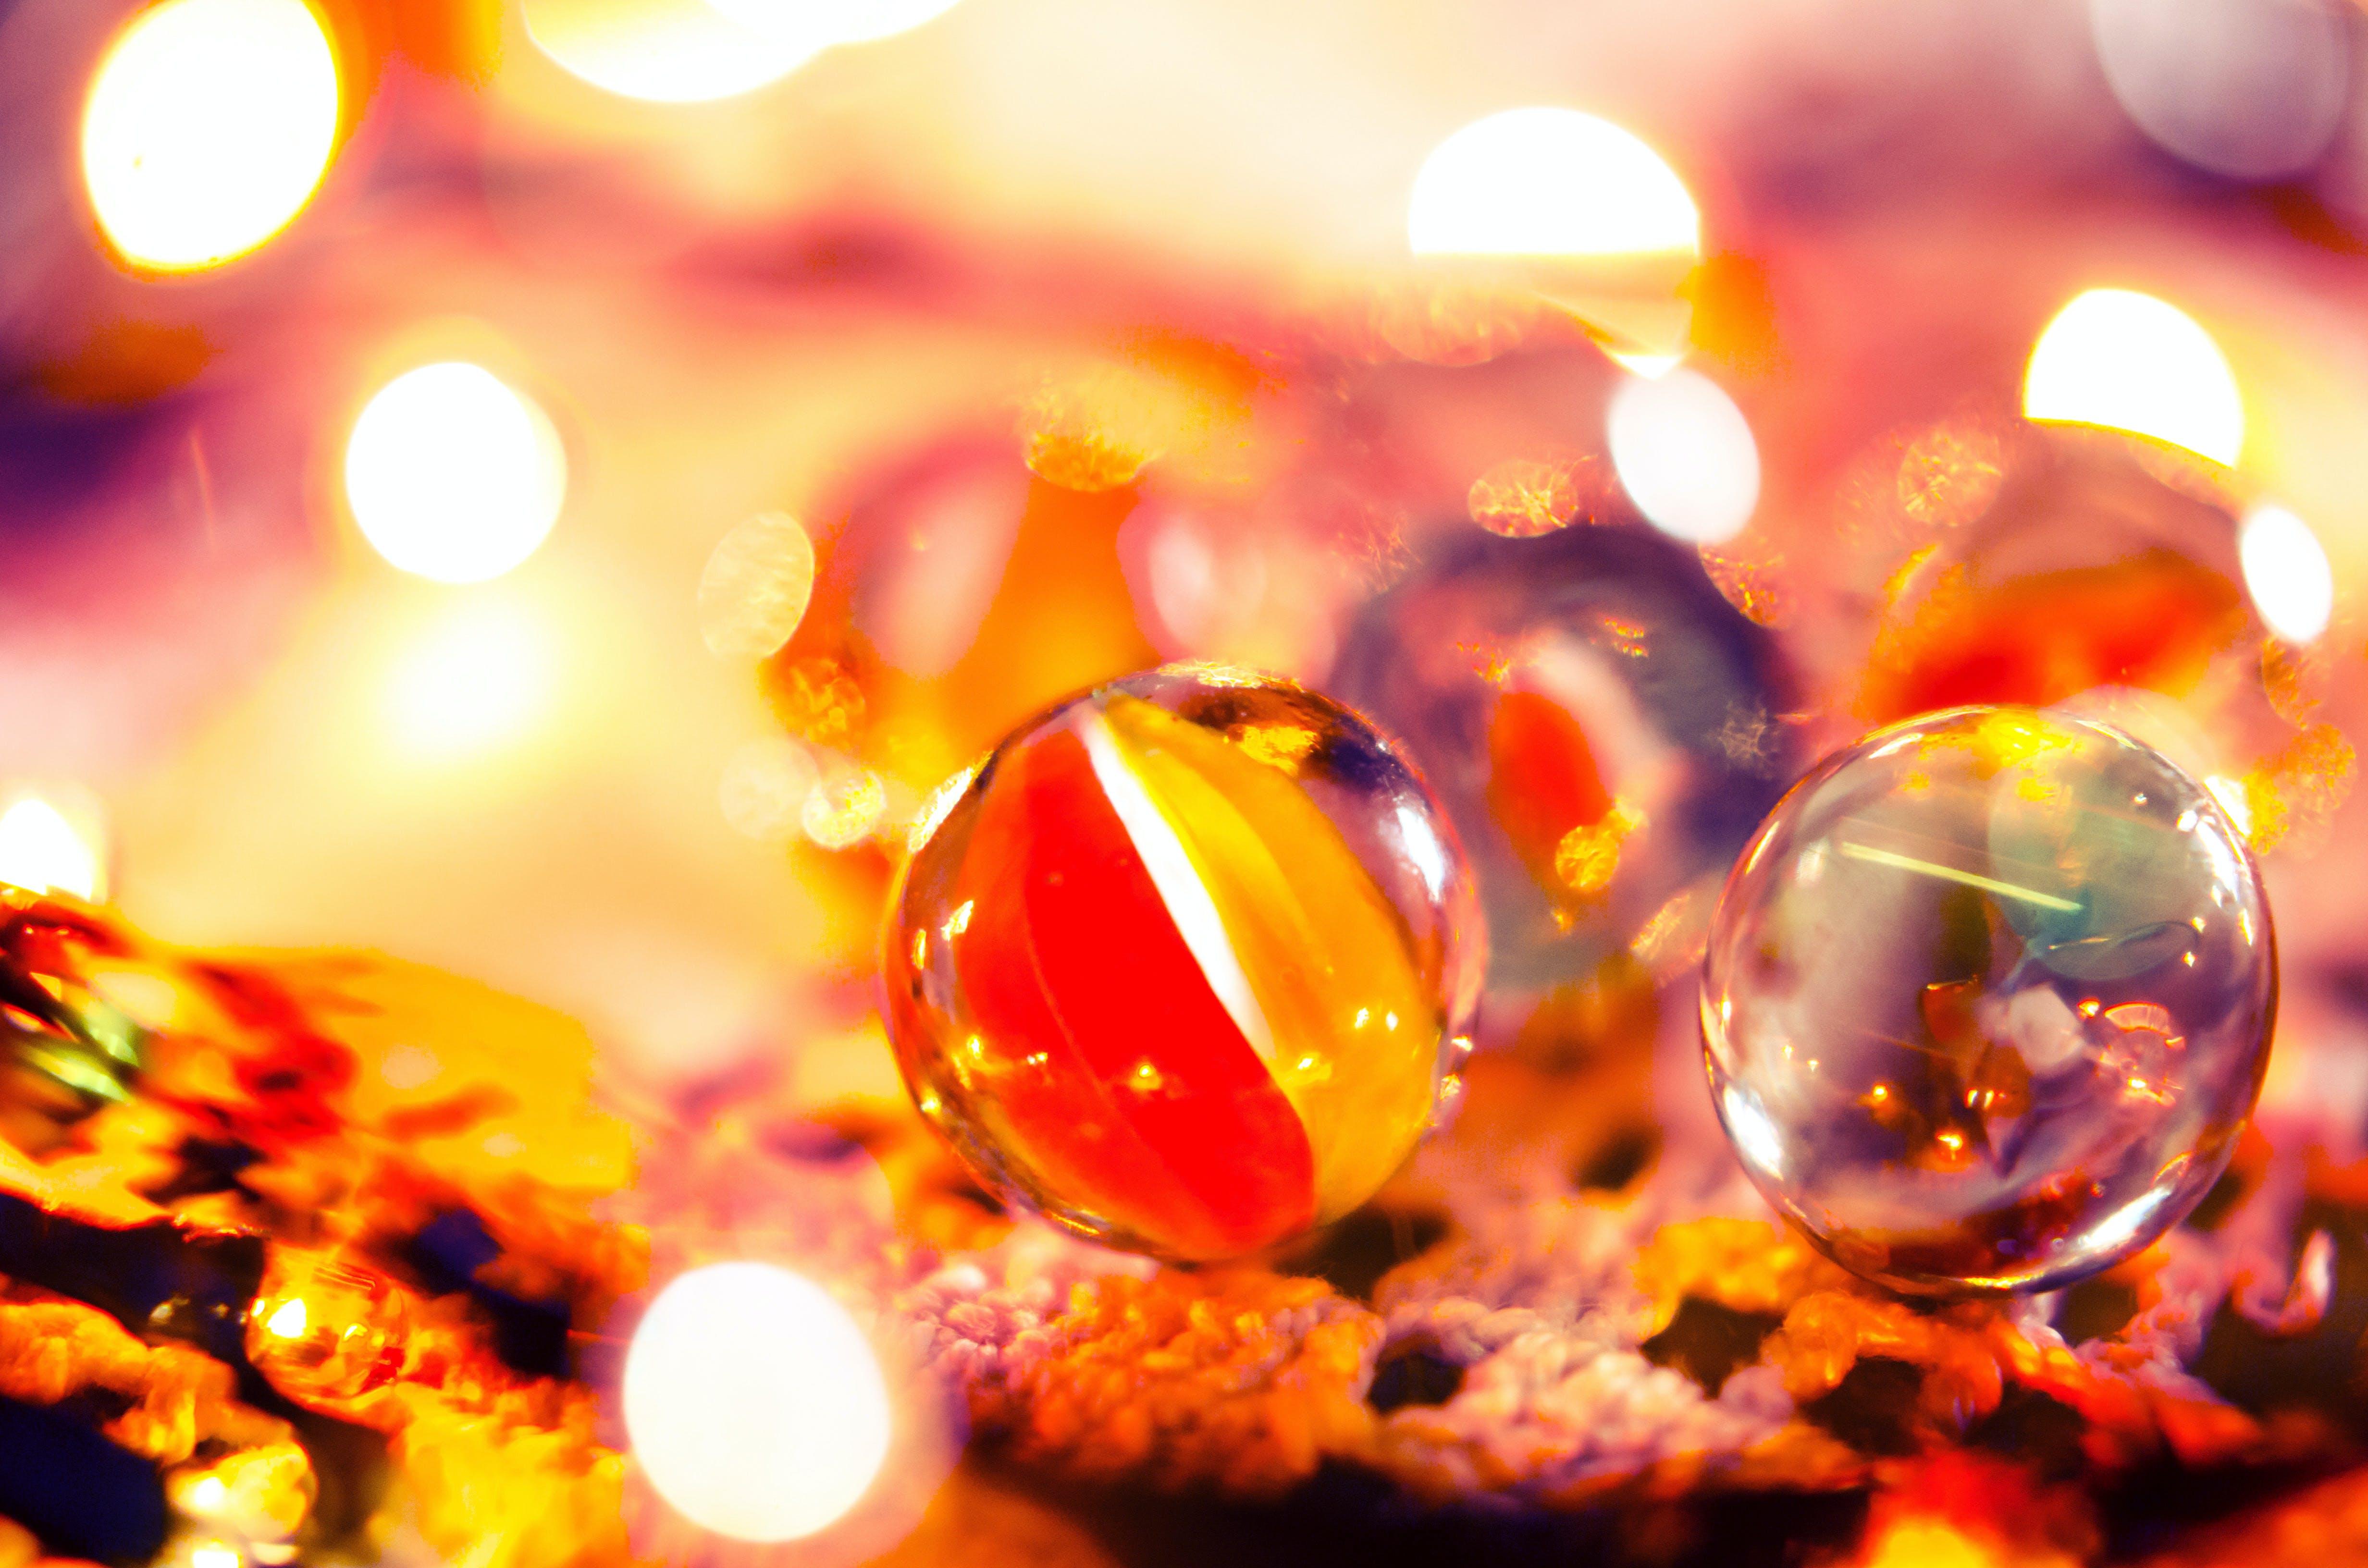 Marble Balls Close-up Photo